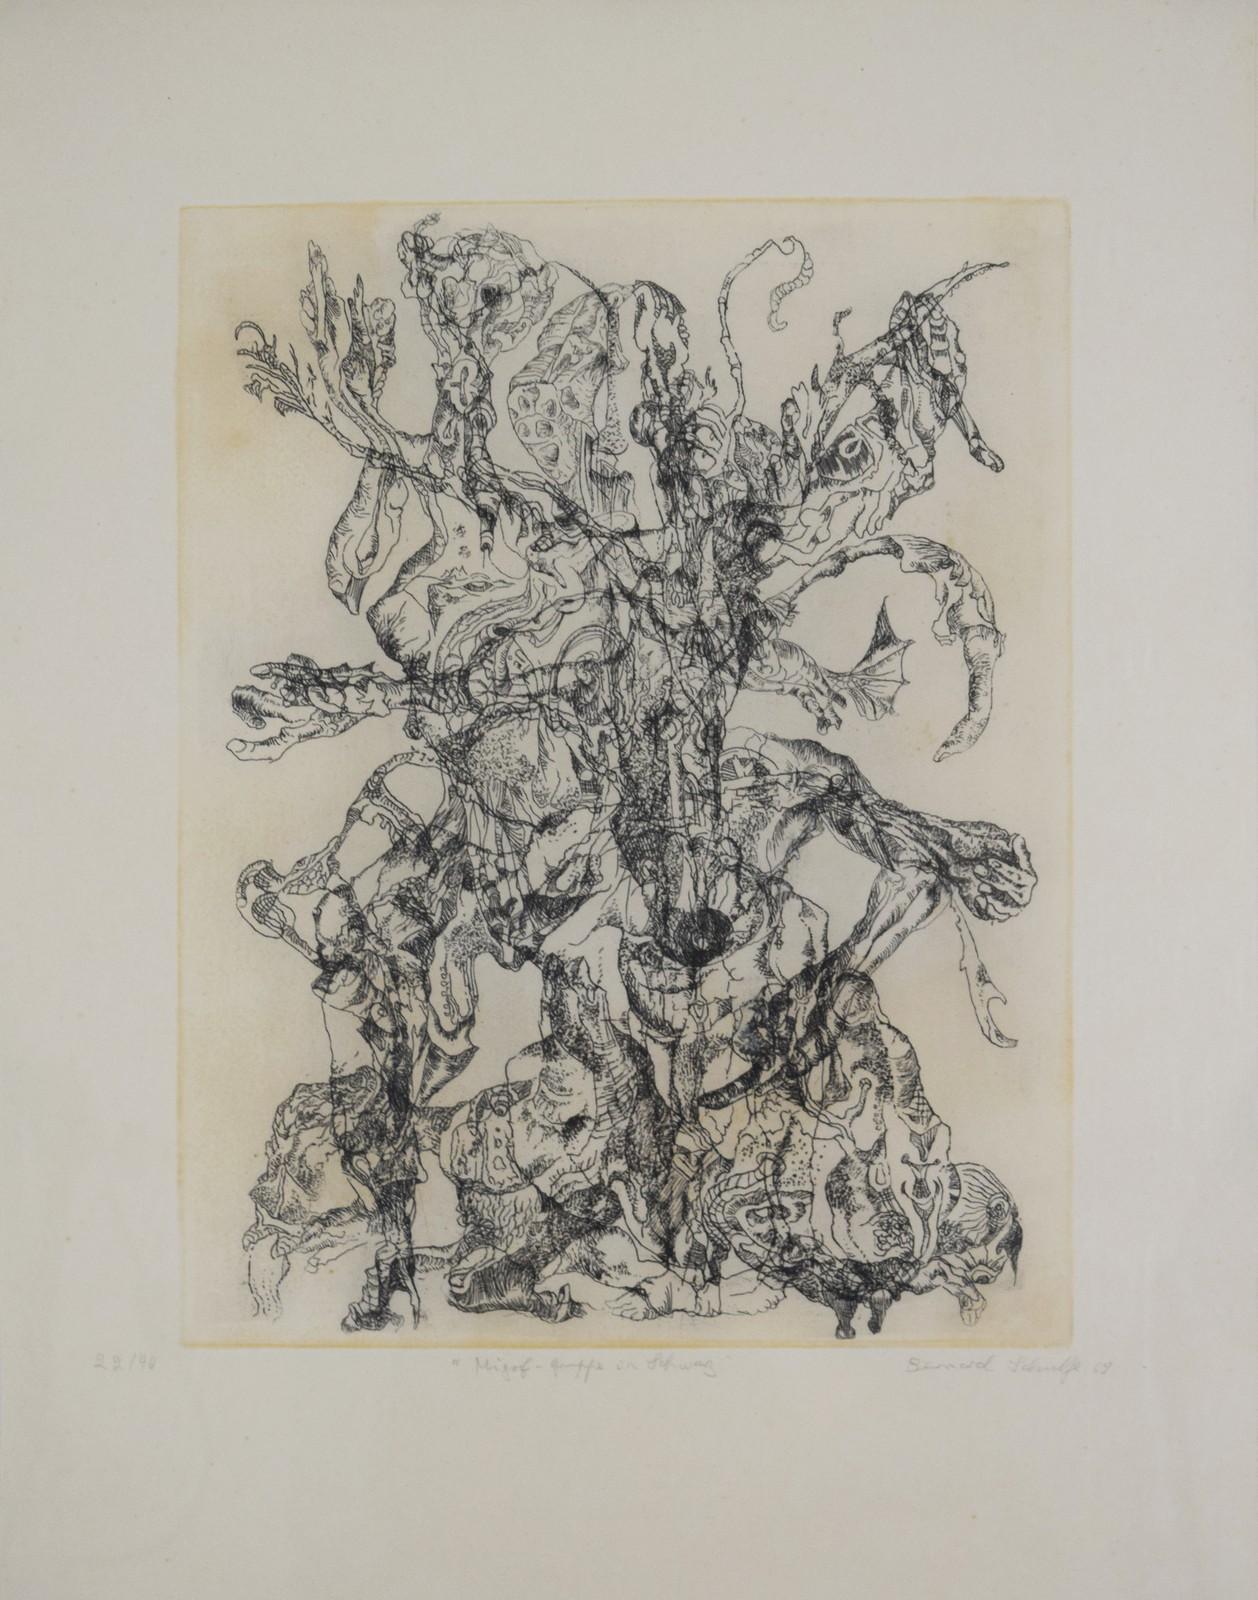 1969, lithograph, 22/40, 29 x 38,5 cm